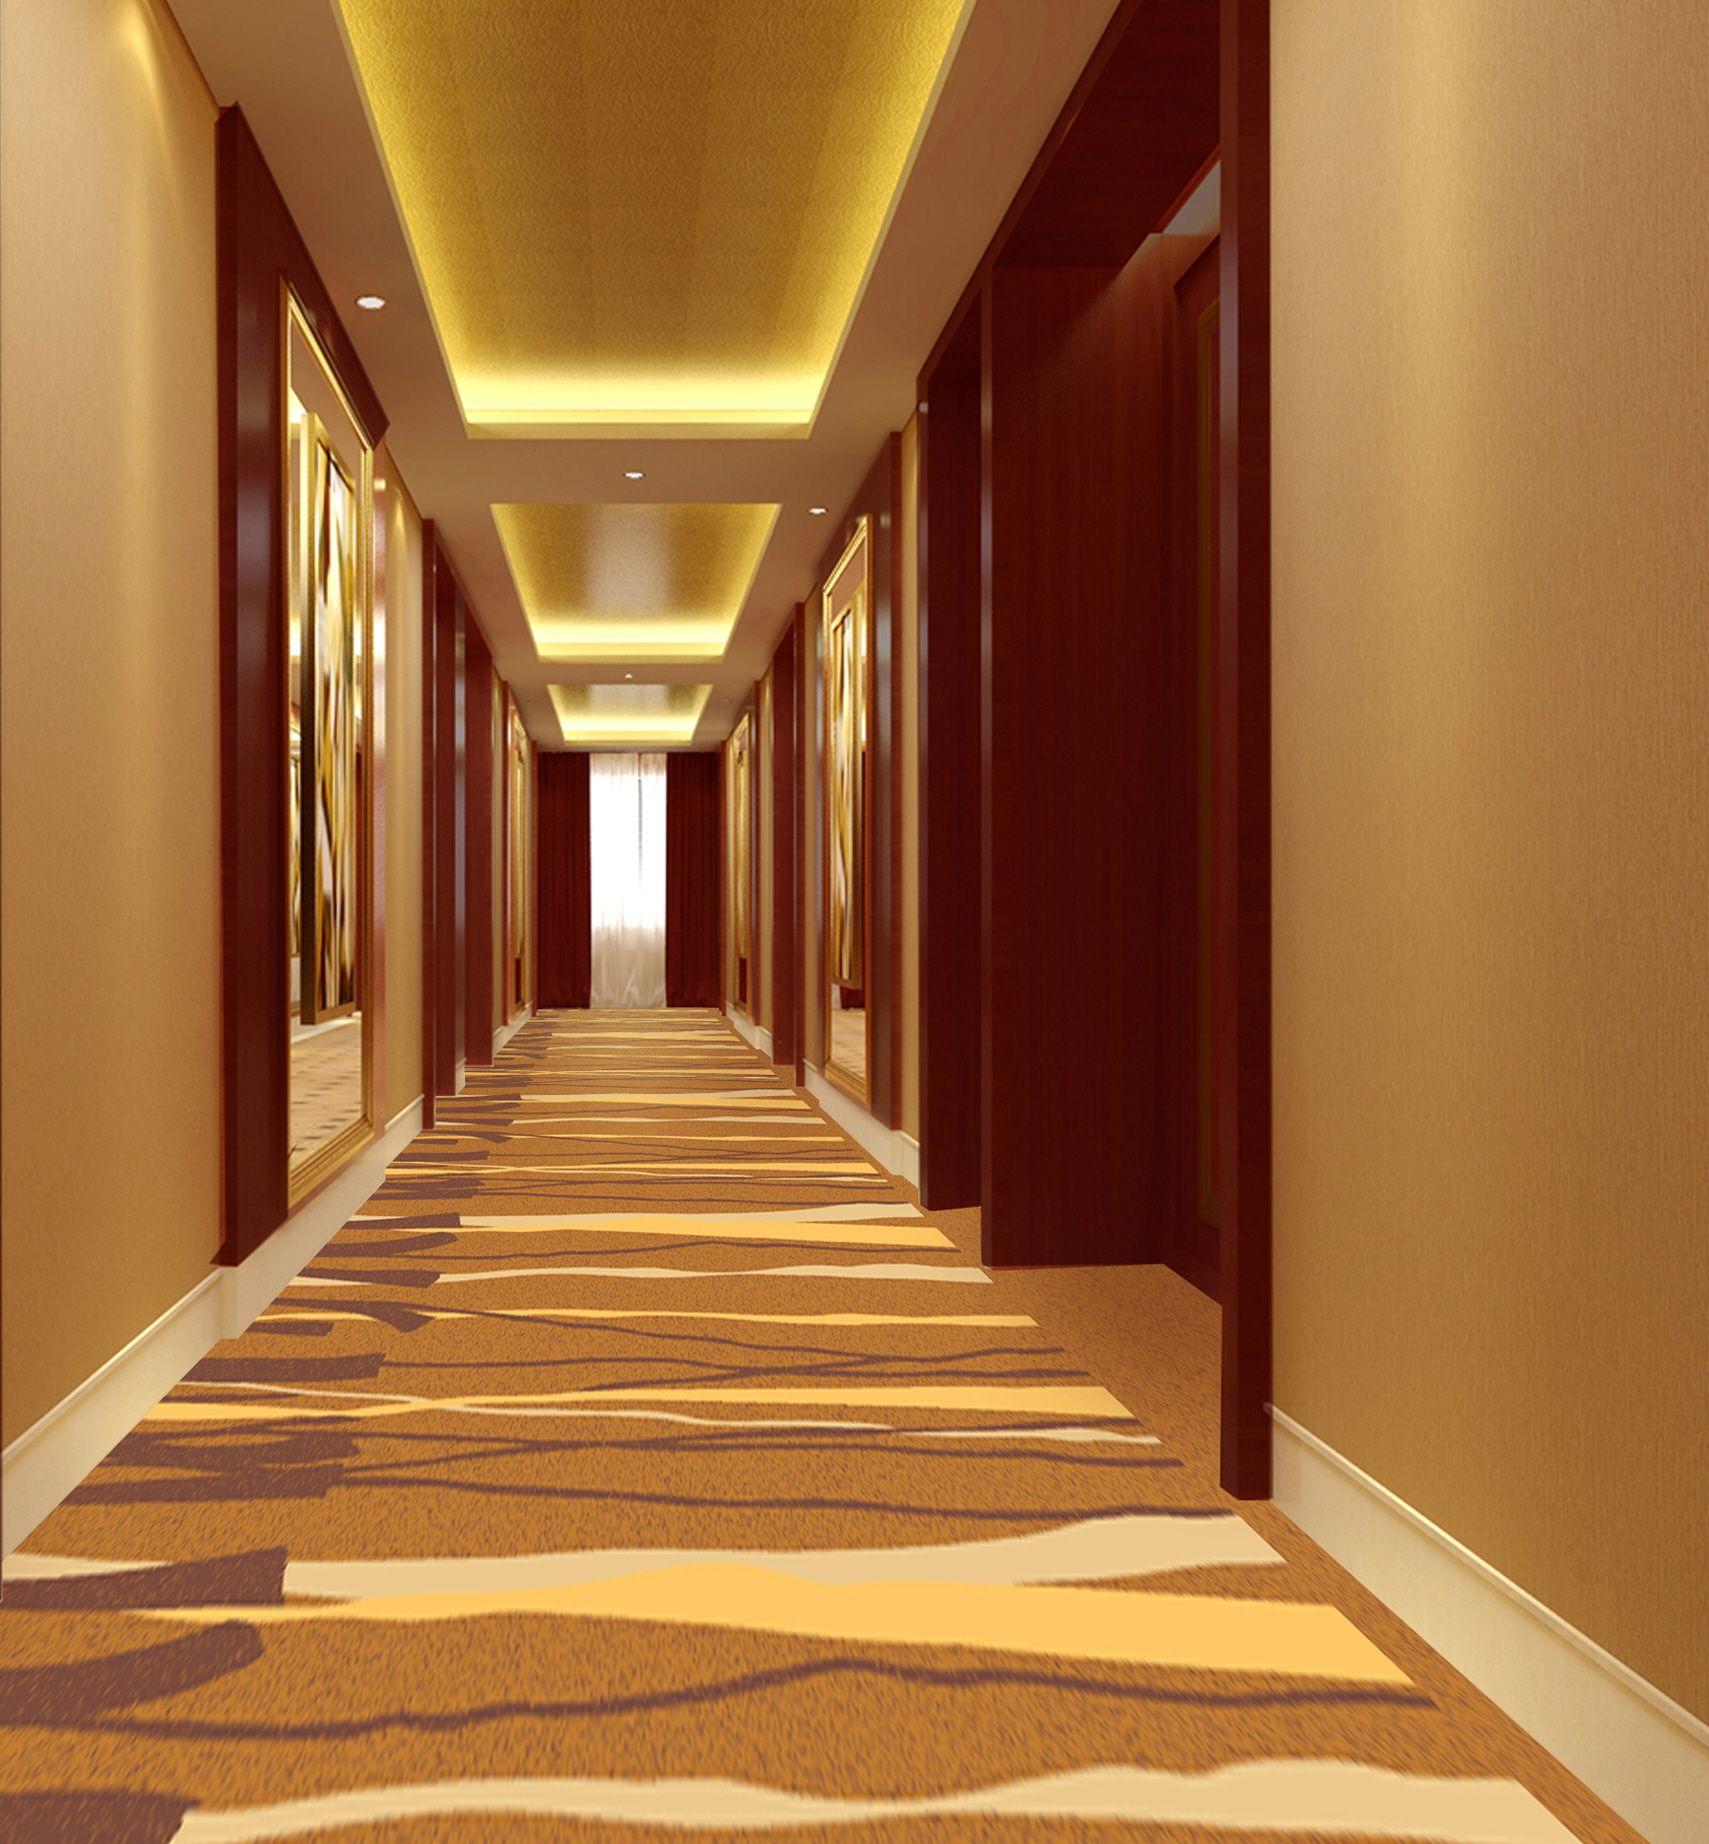 Corridor designing ghar360 corridors pinterest corridor design garage design and tile - Corridor decoratie ...